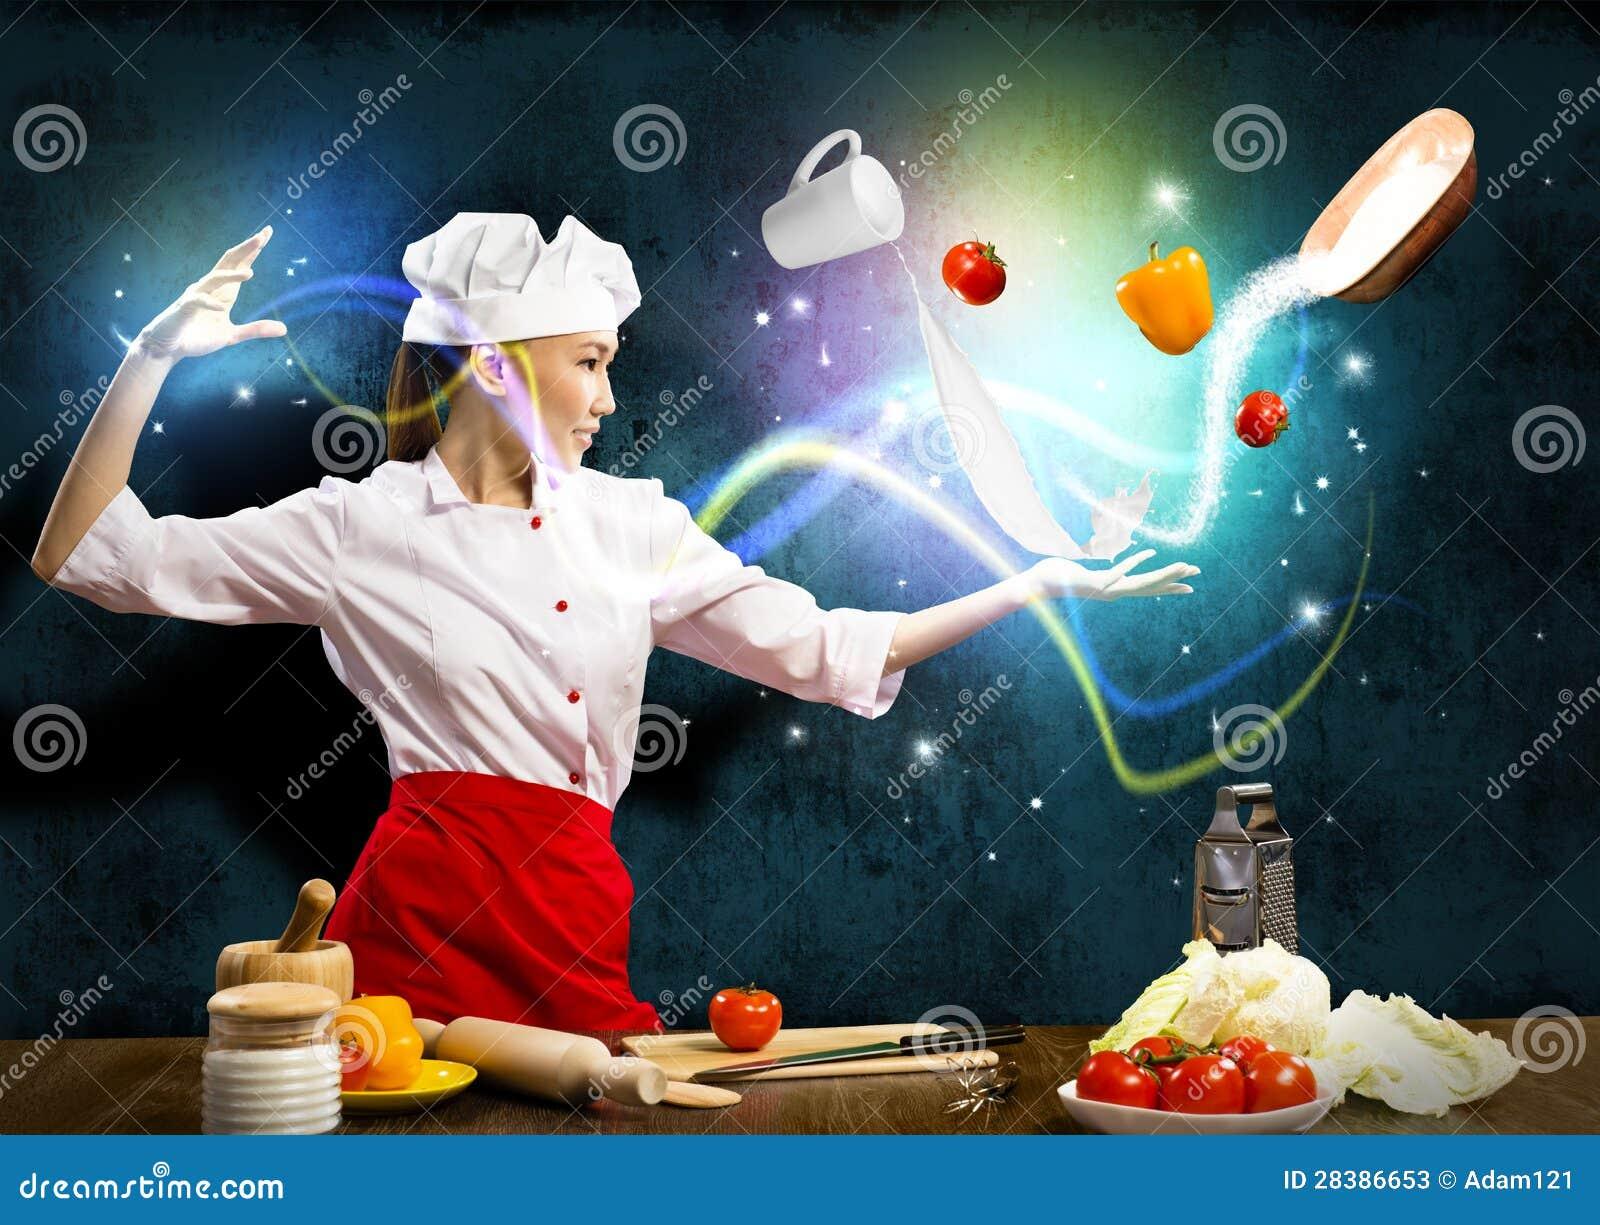 cuisine magique photo stock - image: 45236402